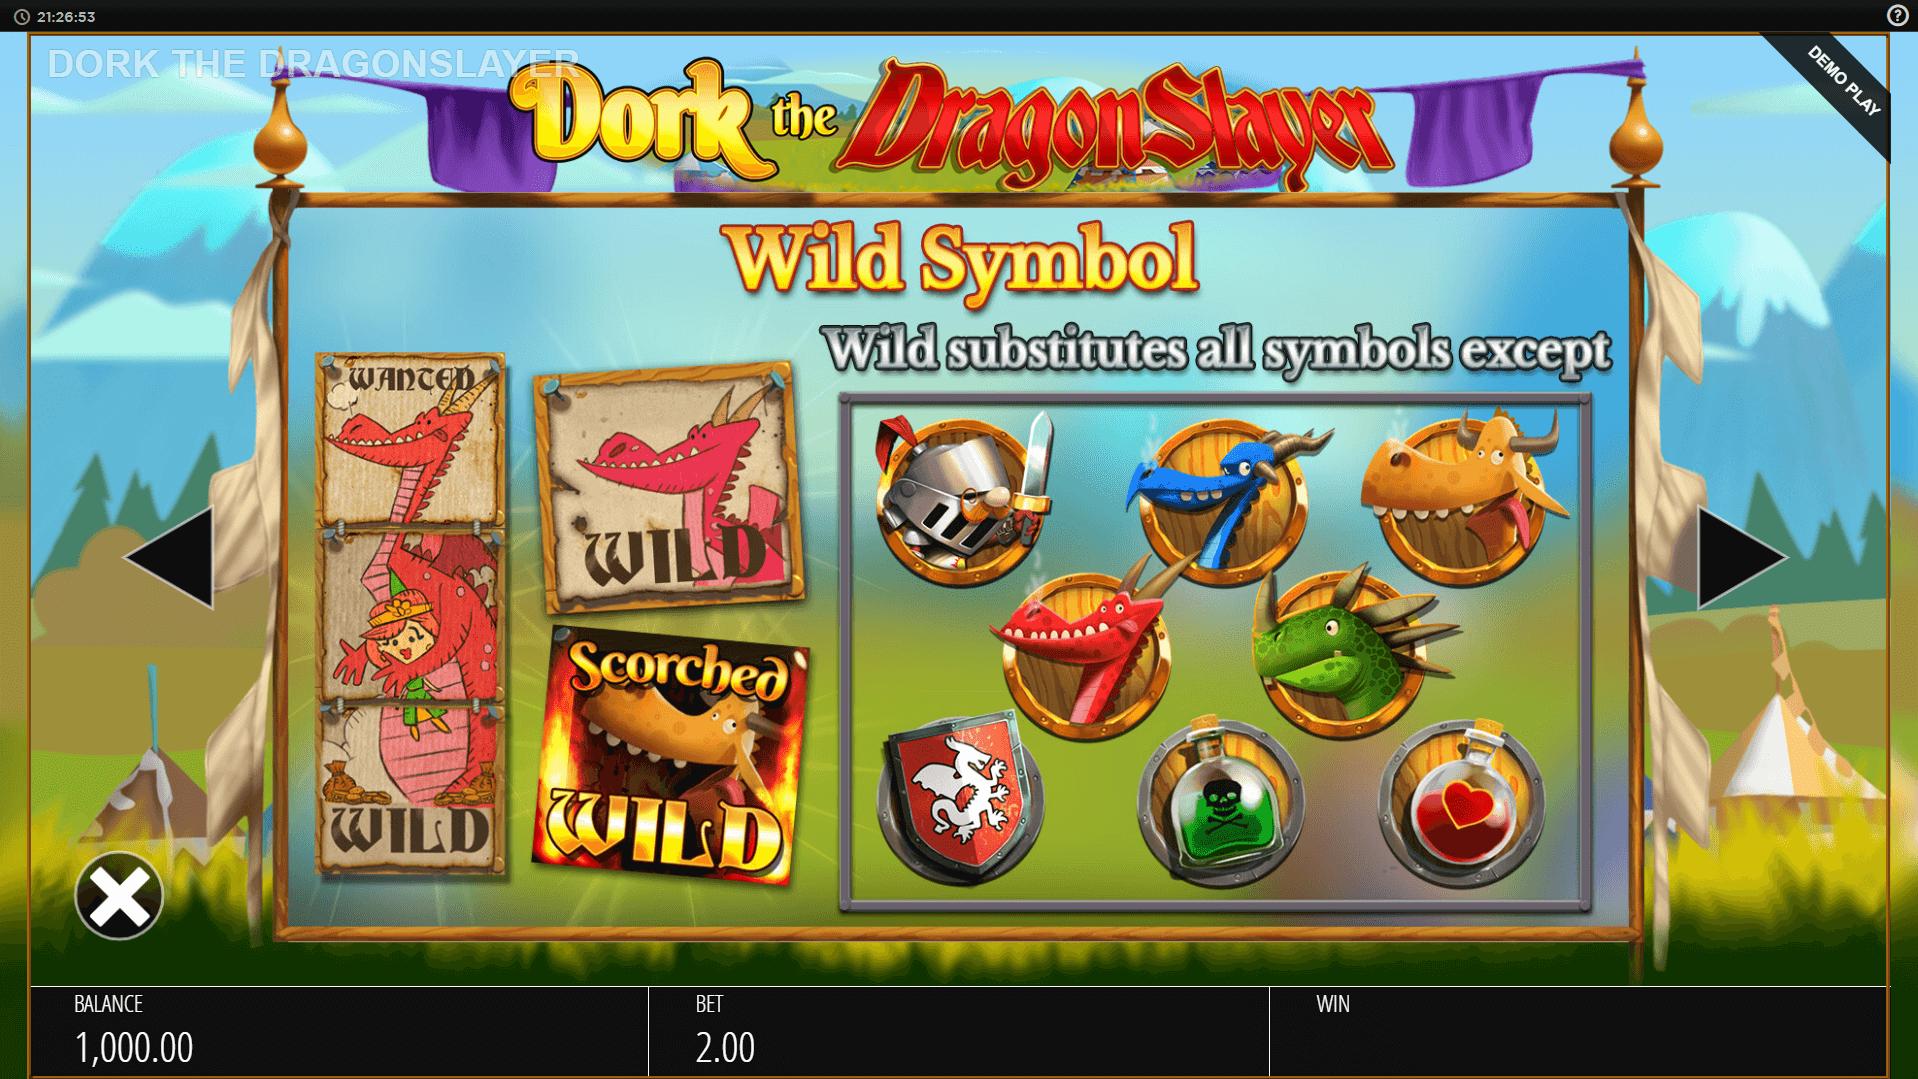 Dragon Slayer Slot Machine